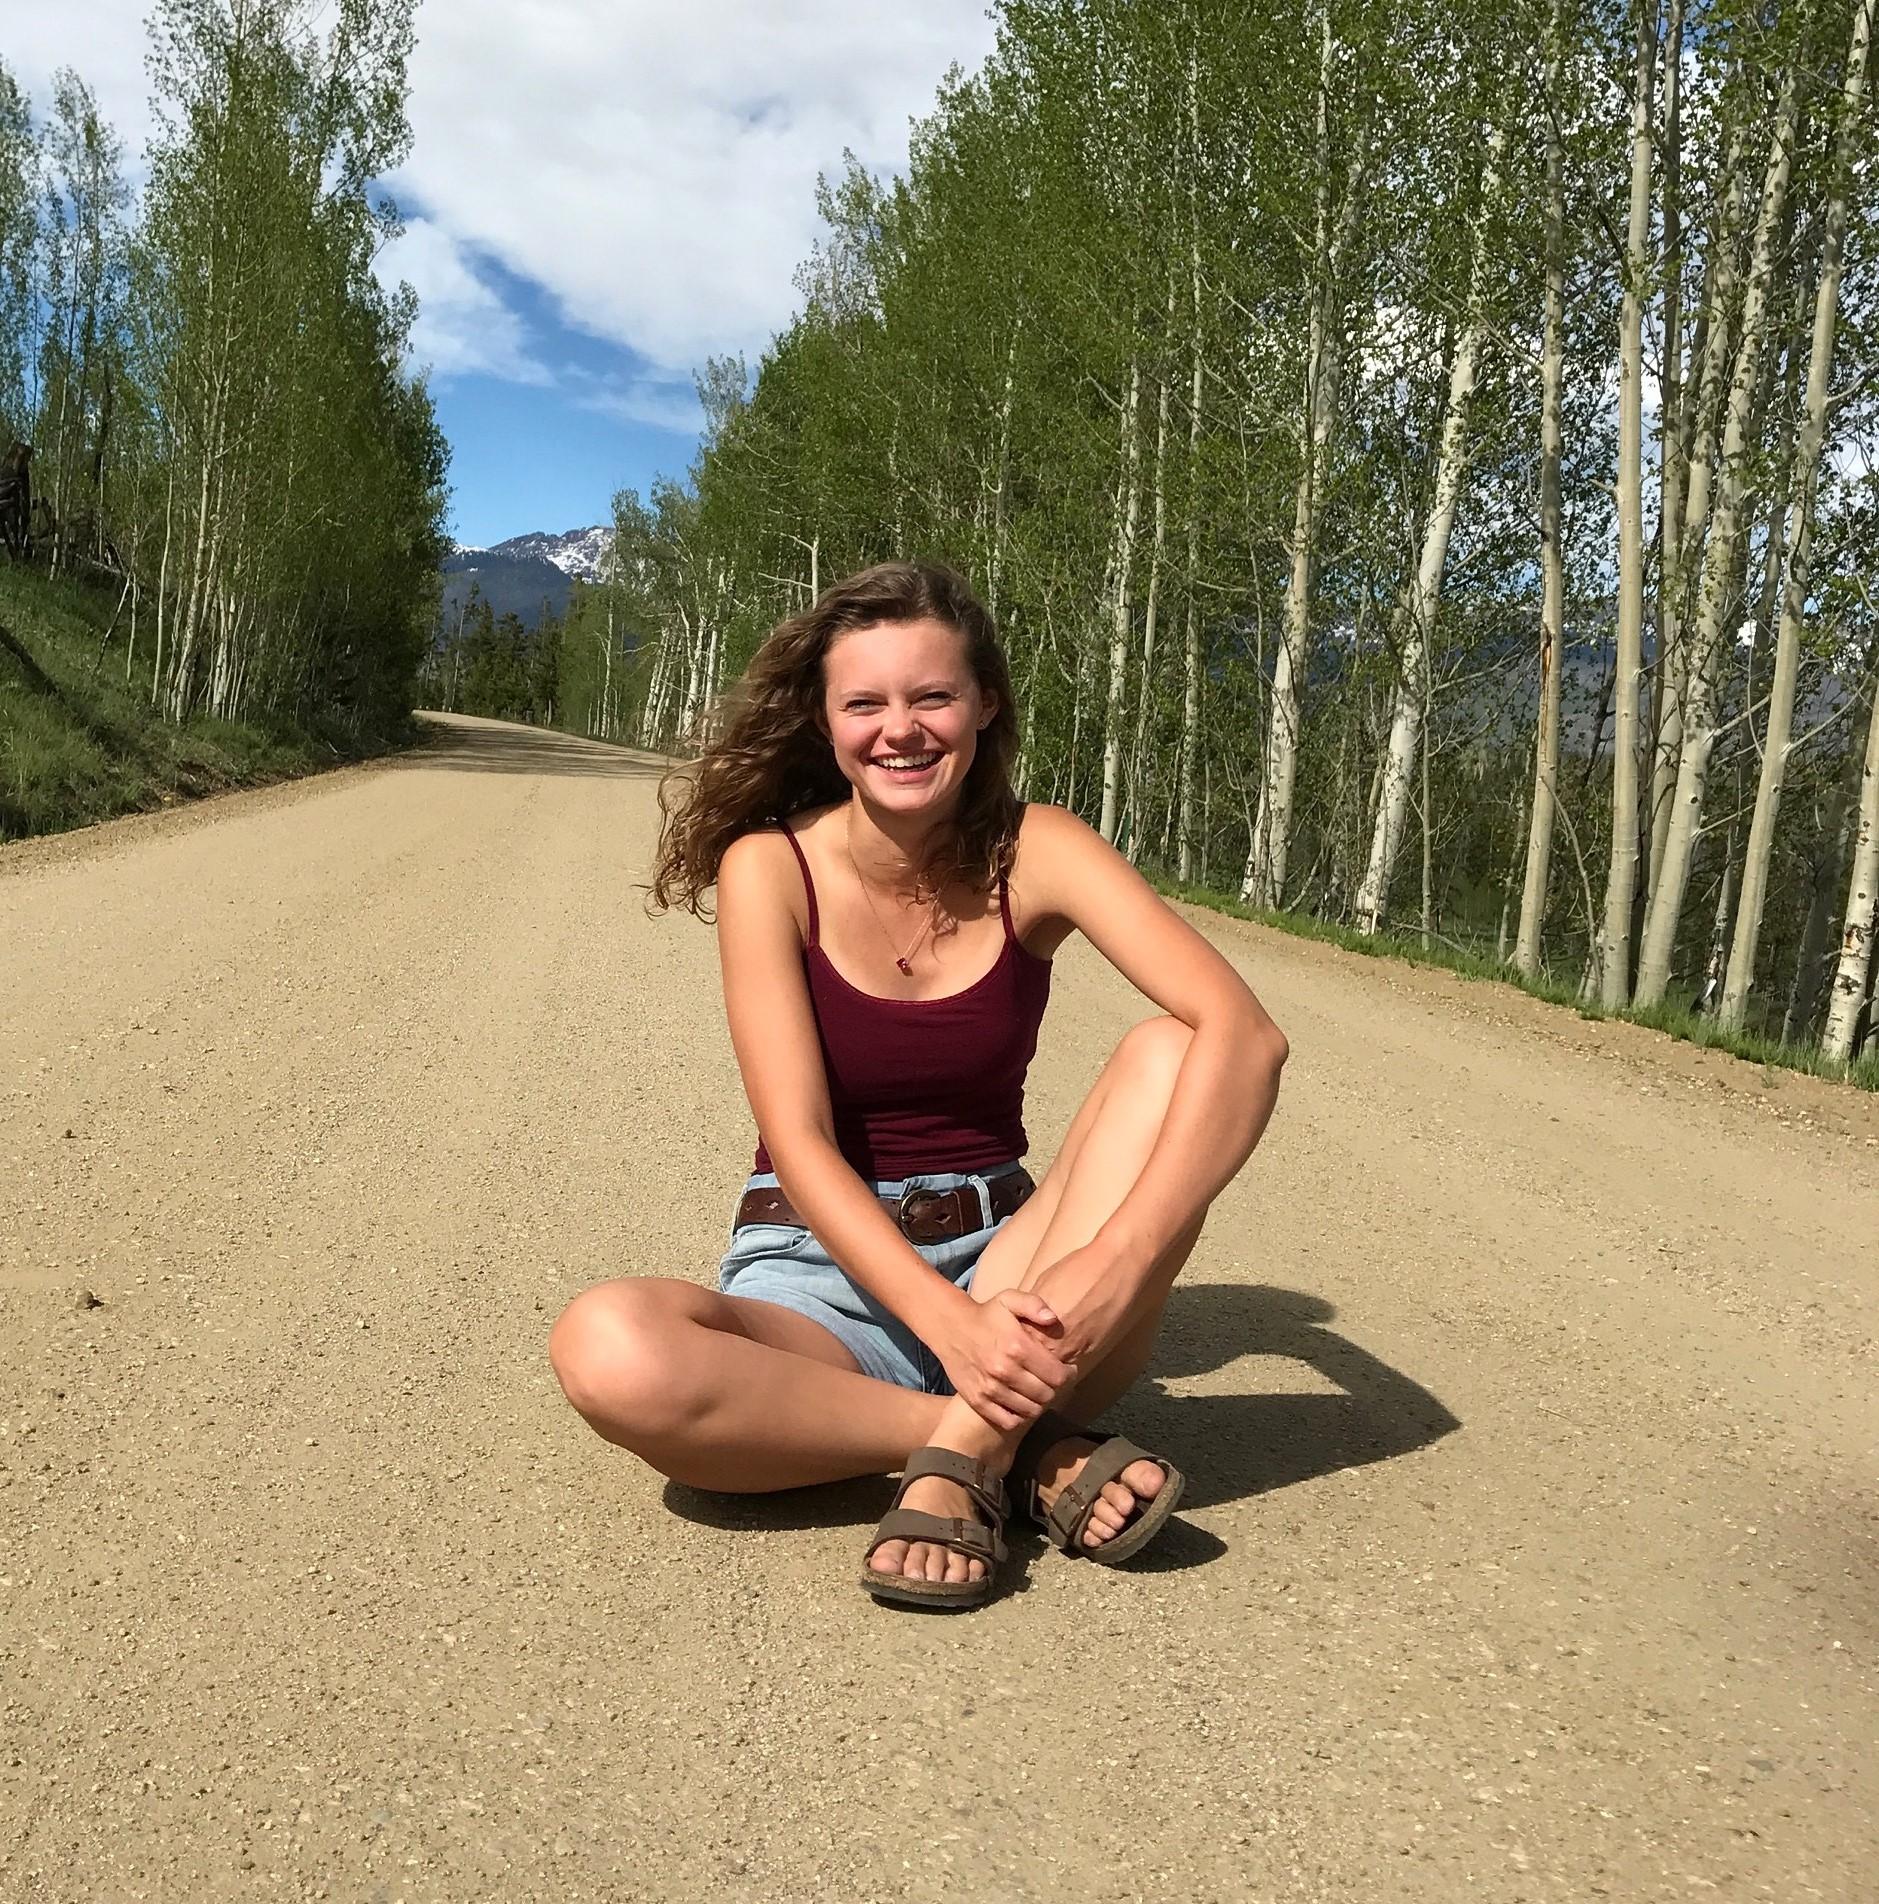 Blog author Christine Slover